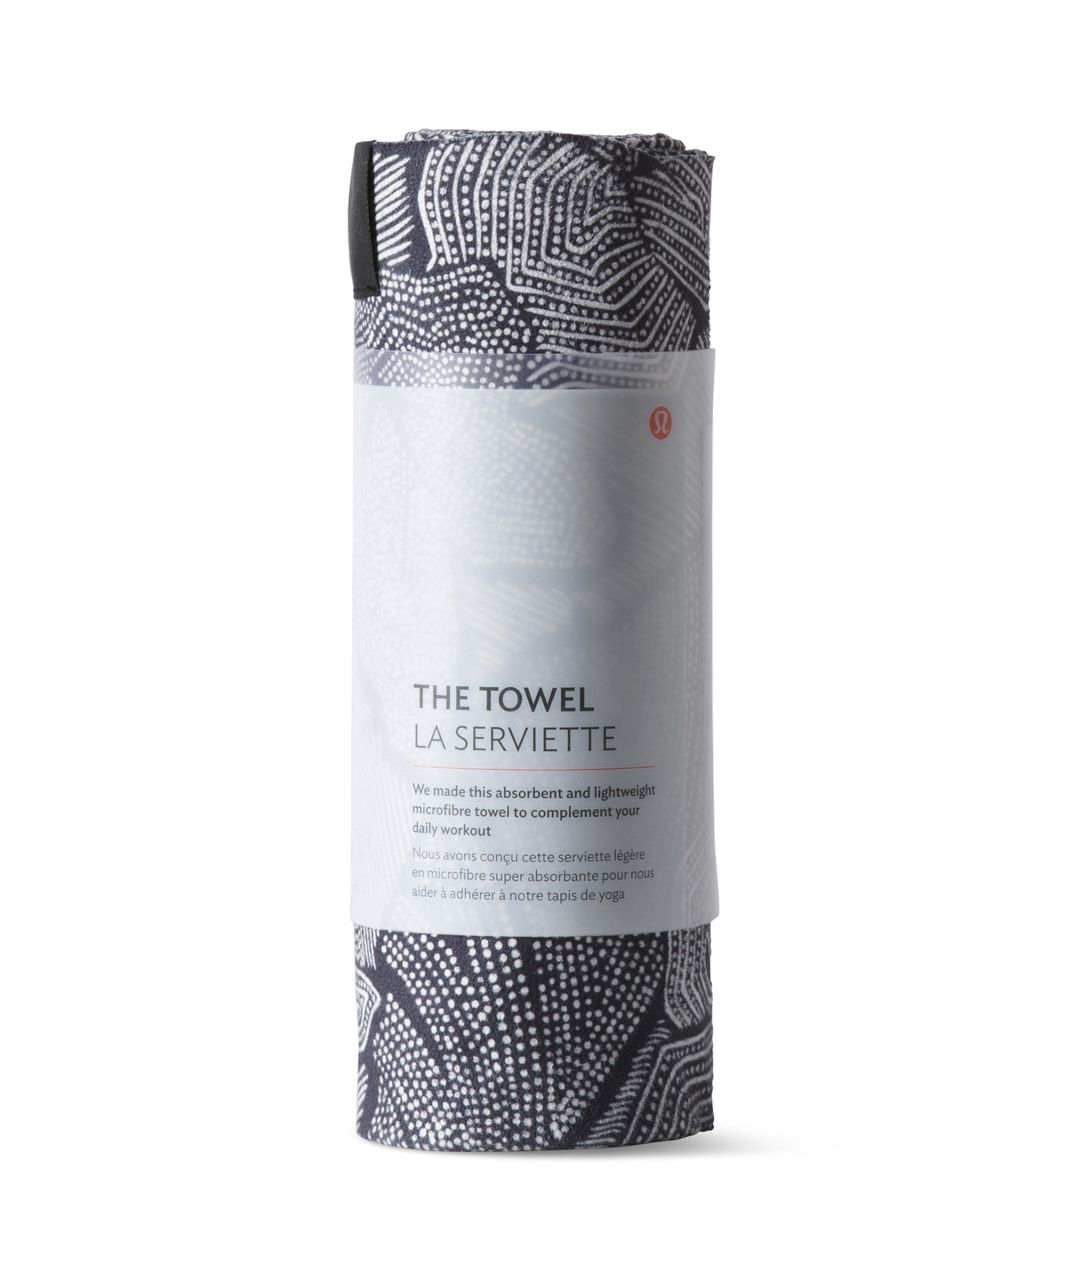 Lululemon The Towel - Dottie Tribe White Black